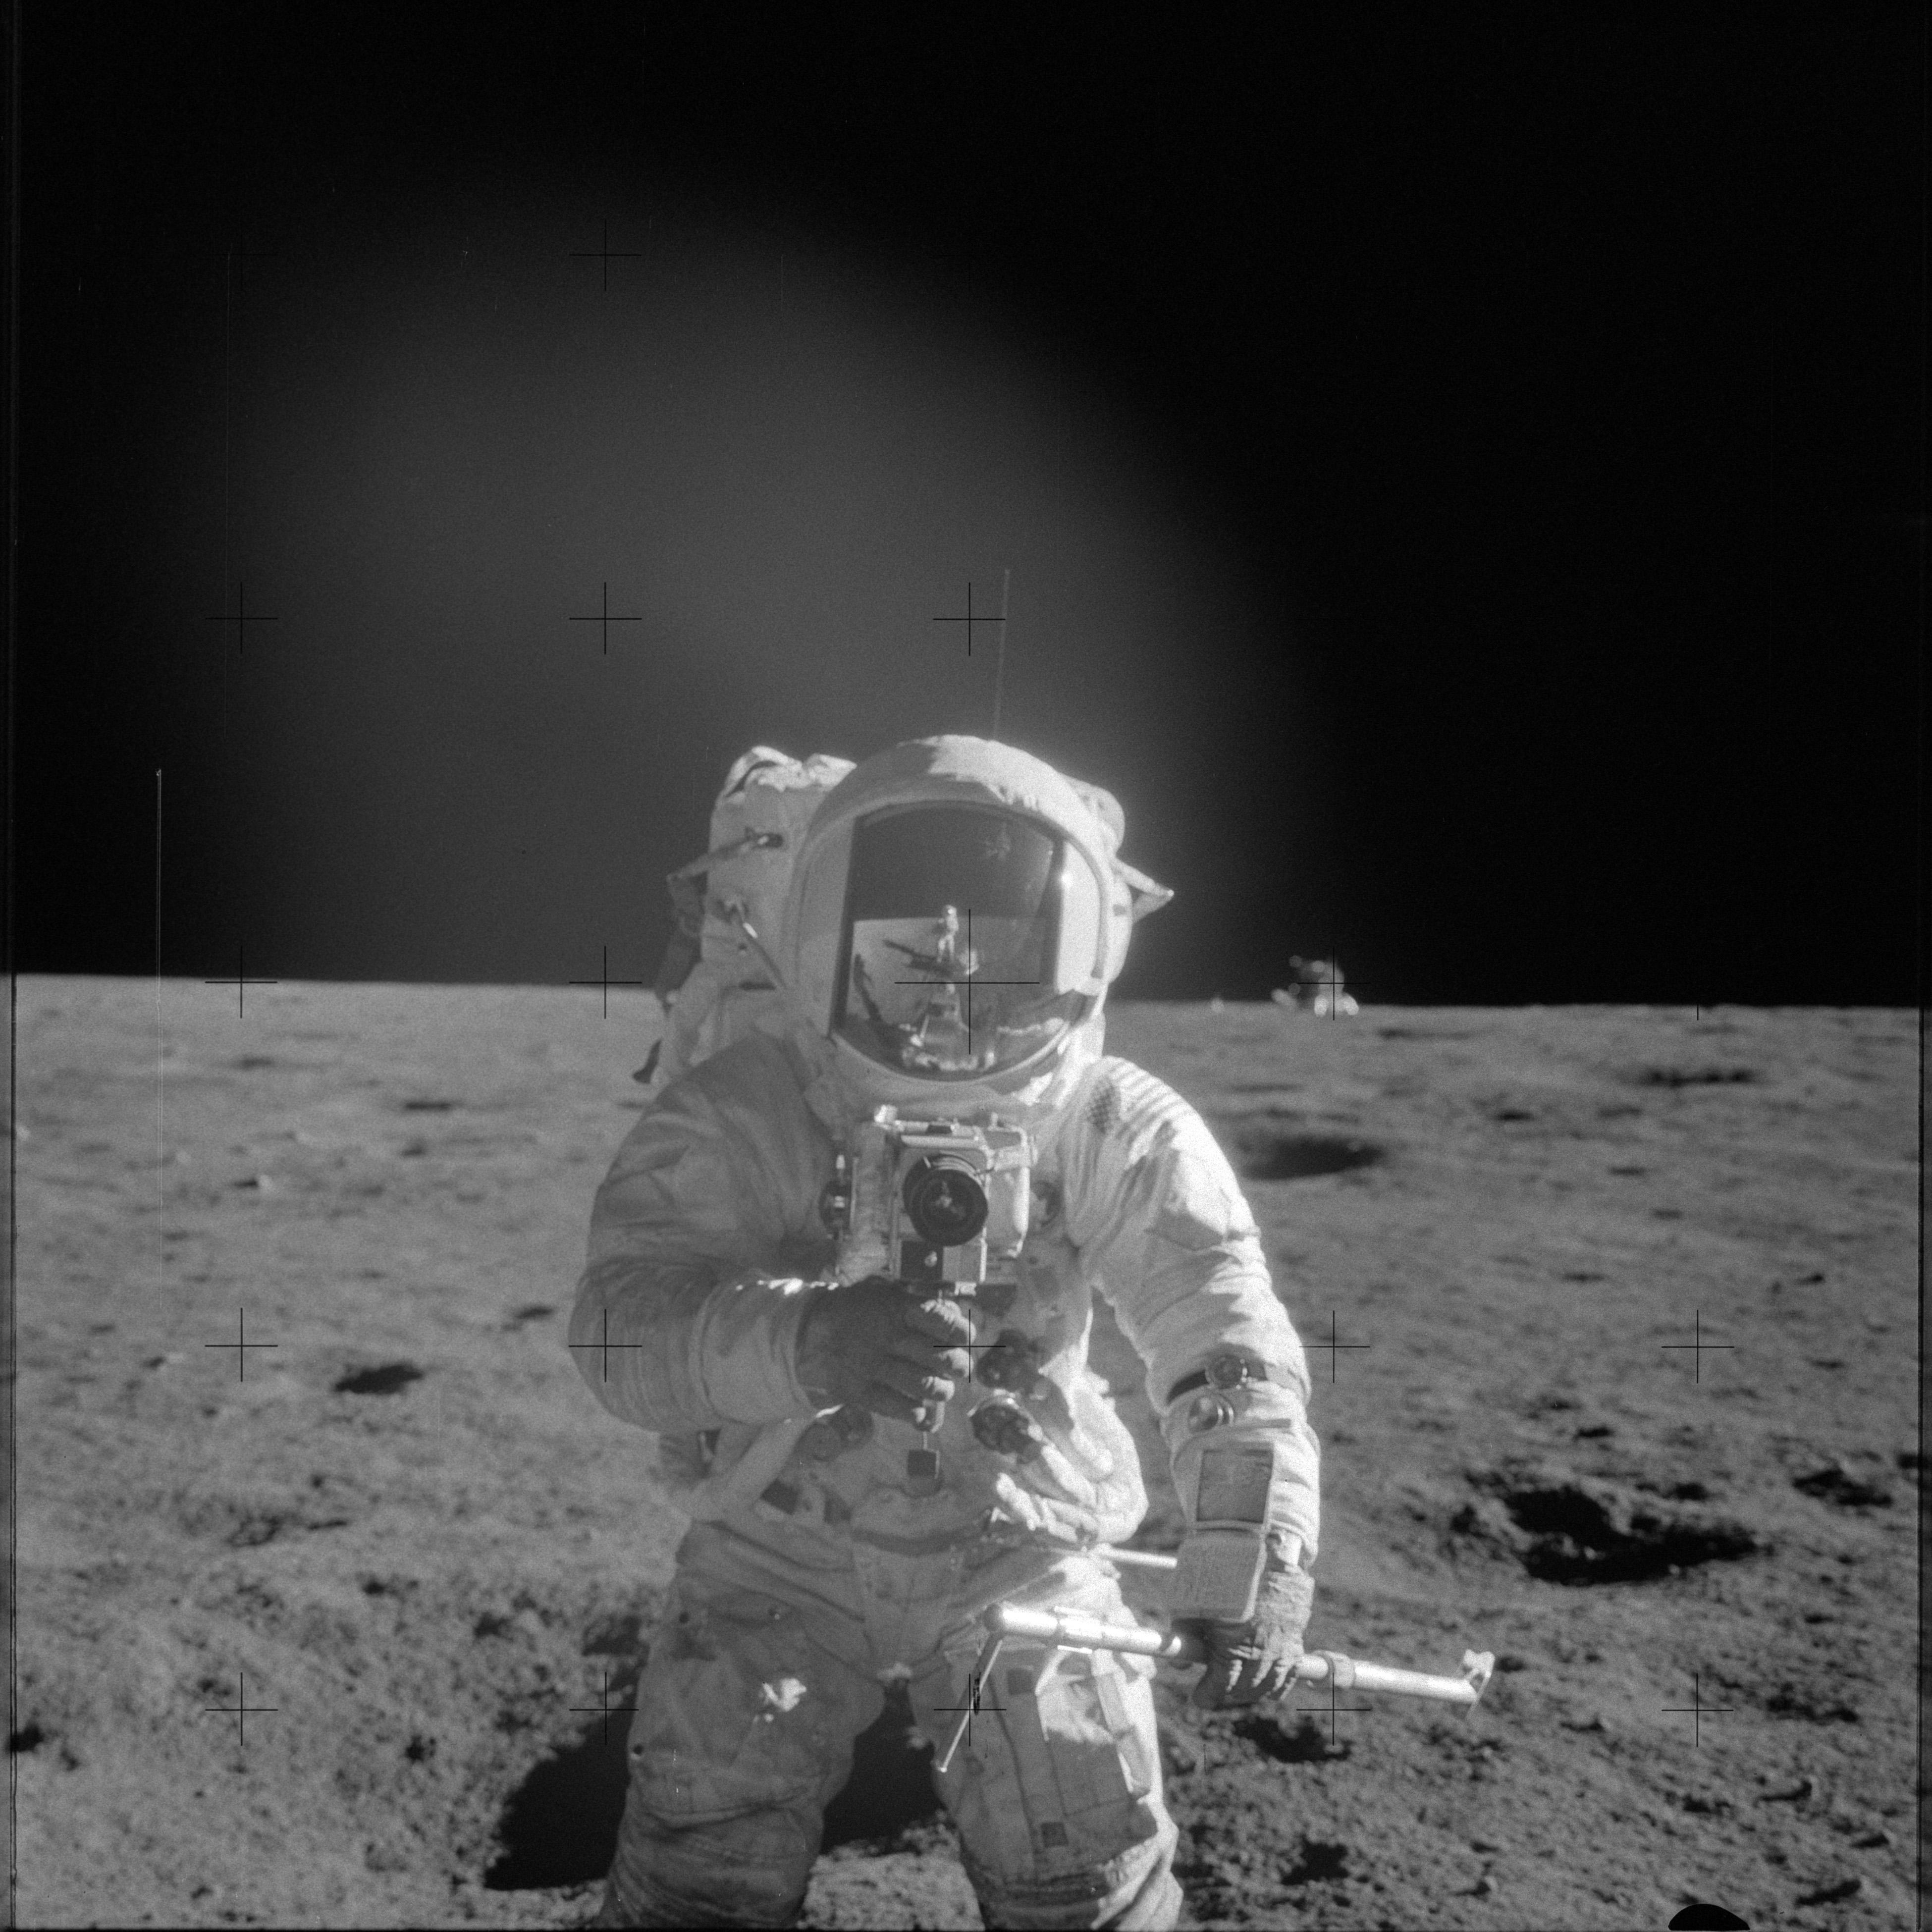 apollo missions discoveries - photo #18